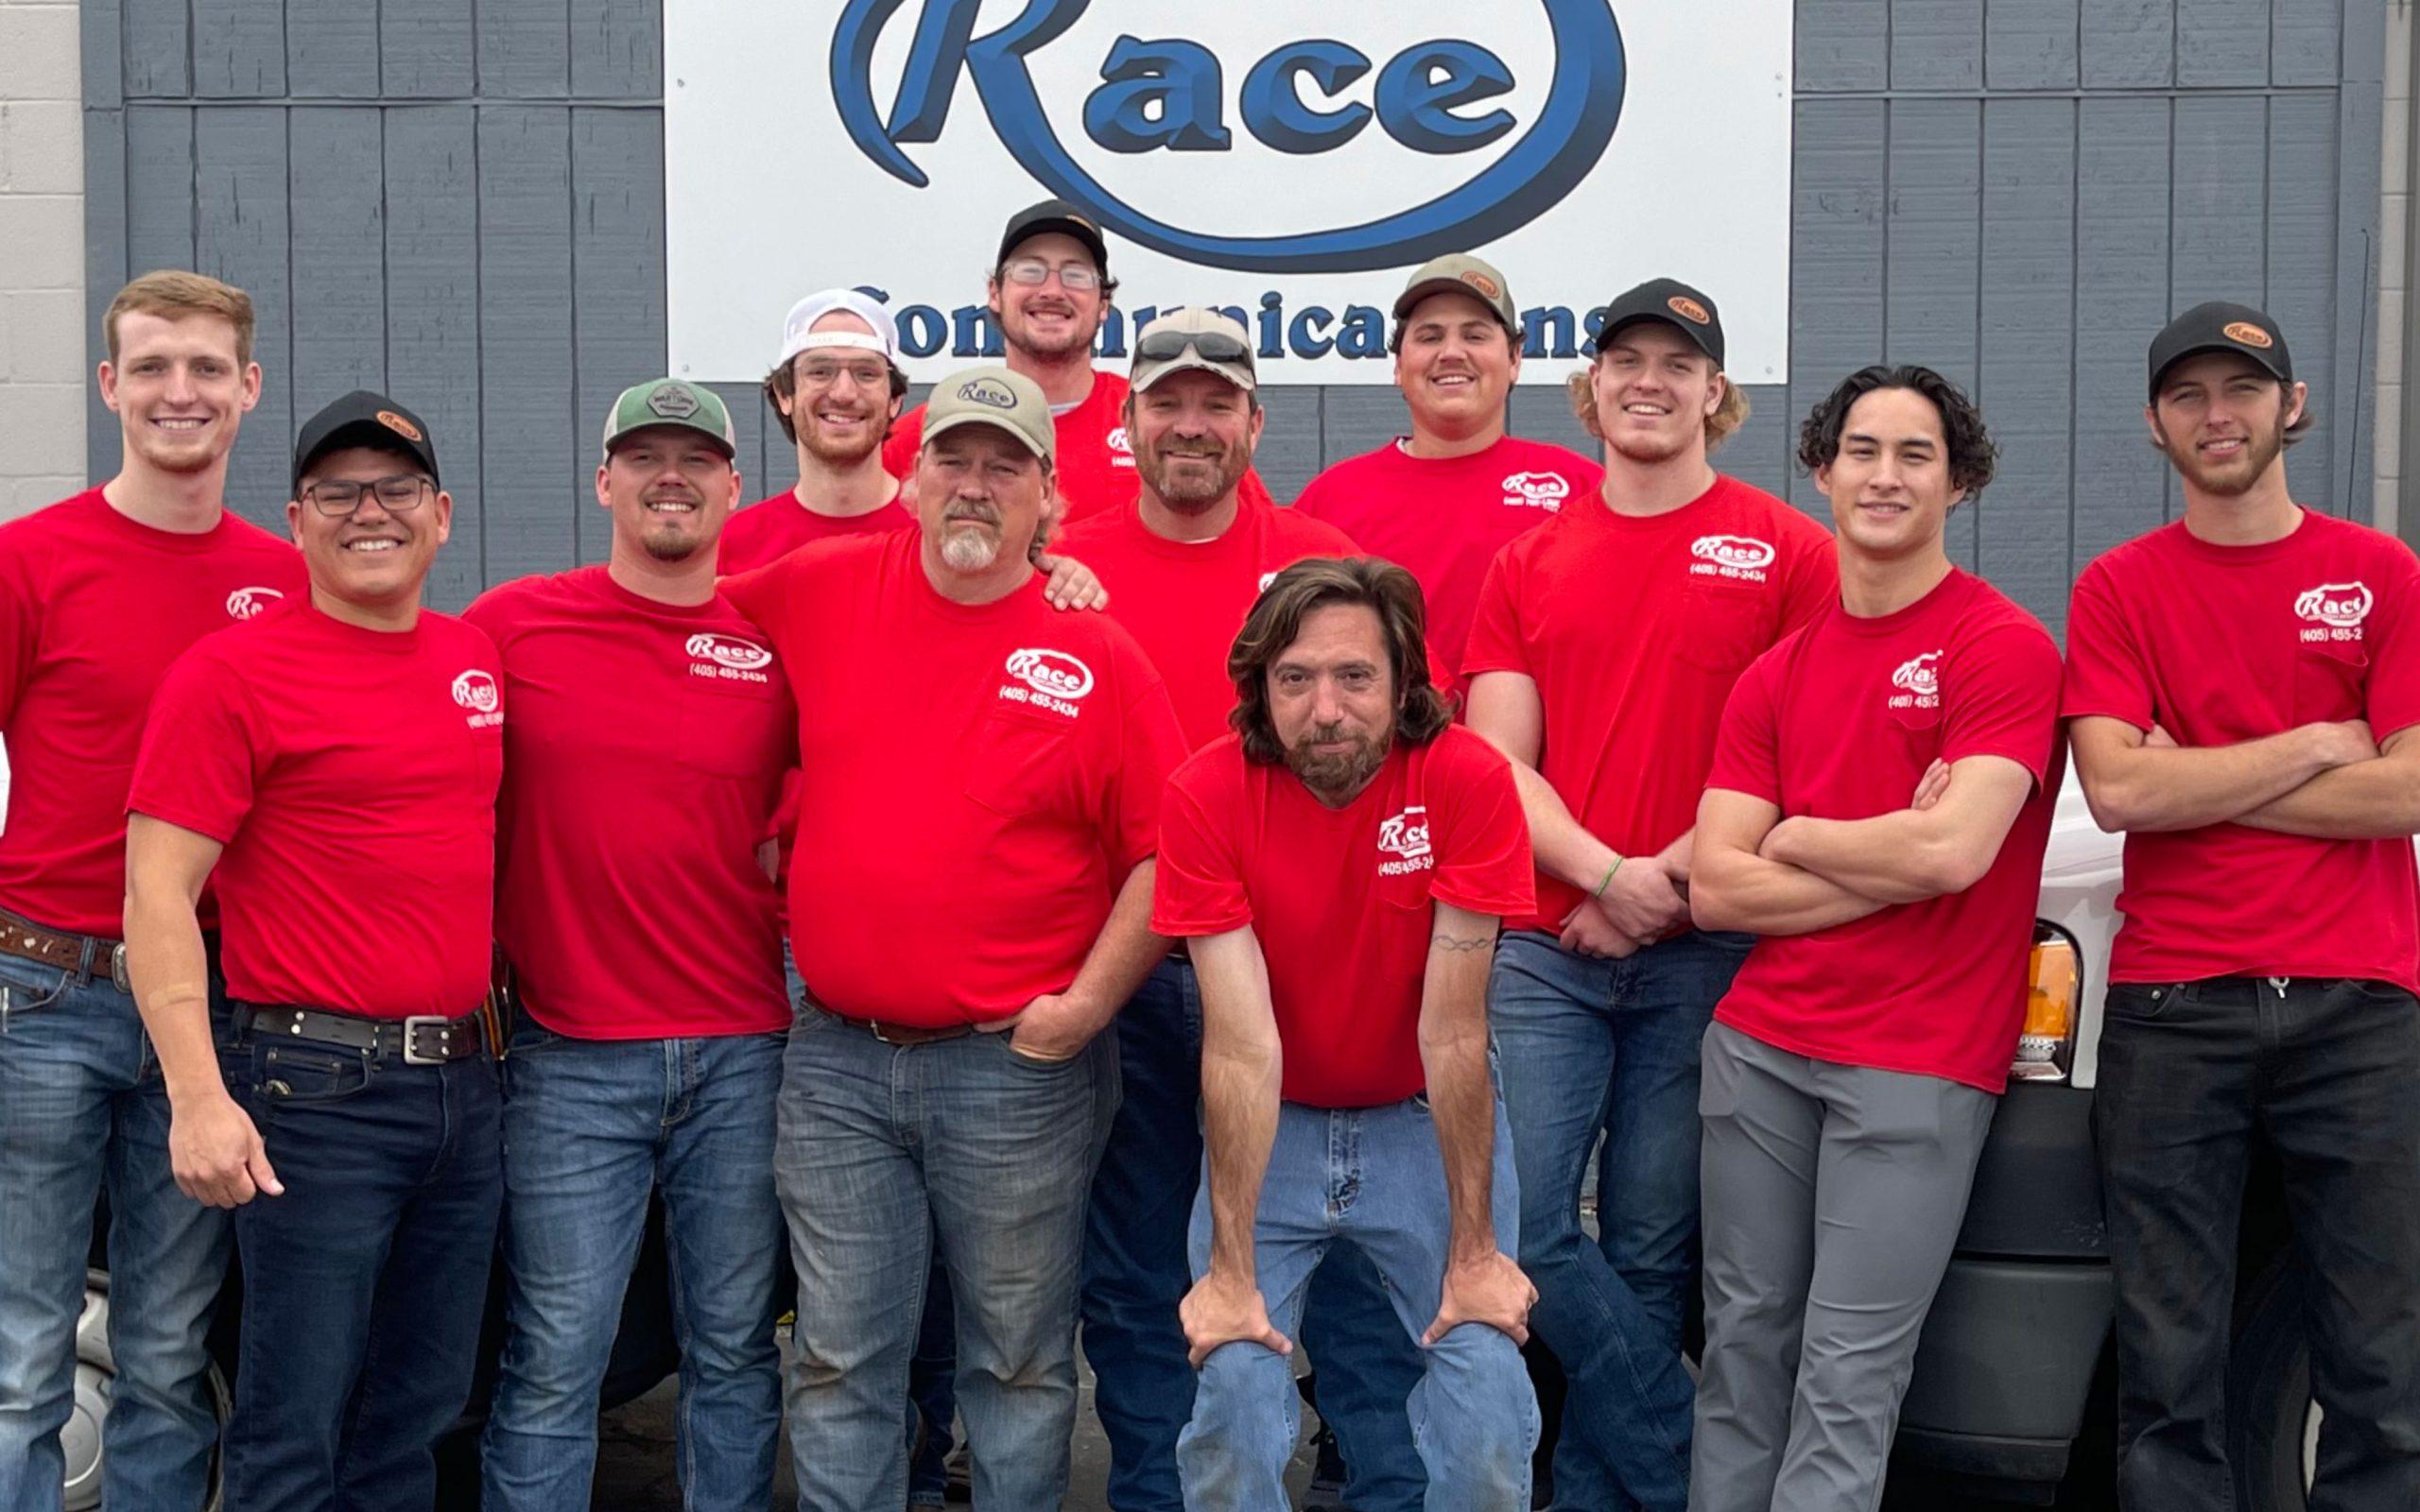 Race Communications - Group Photo